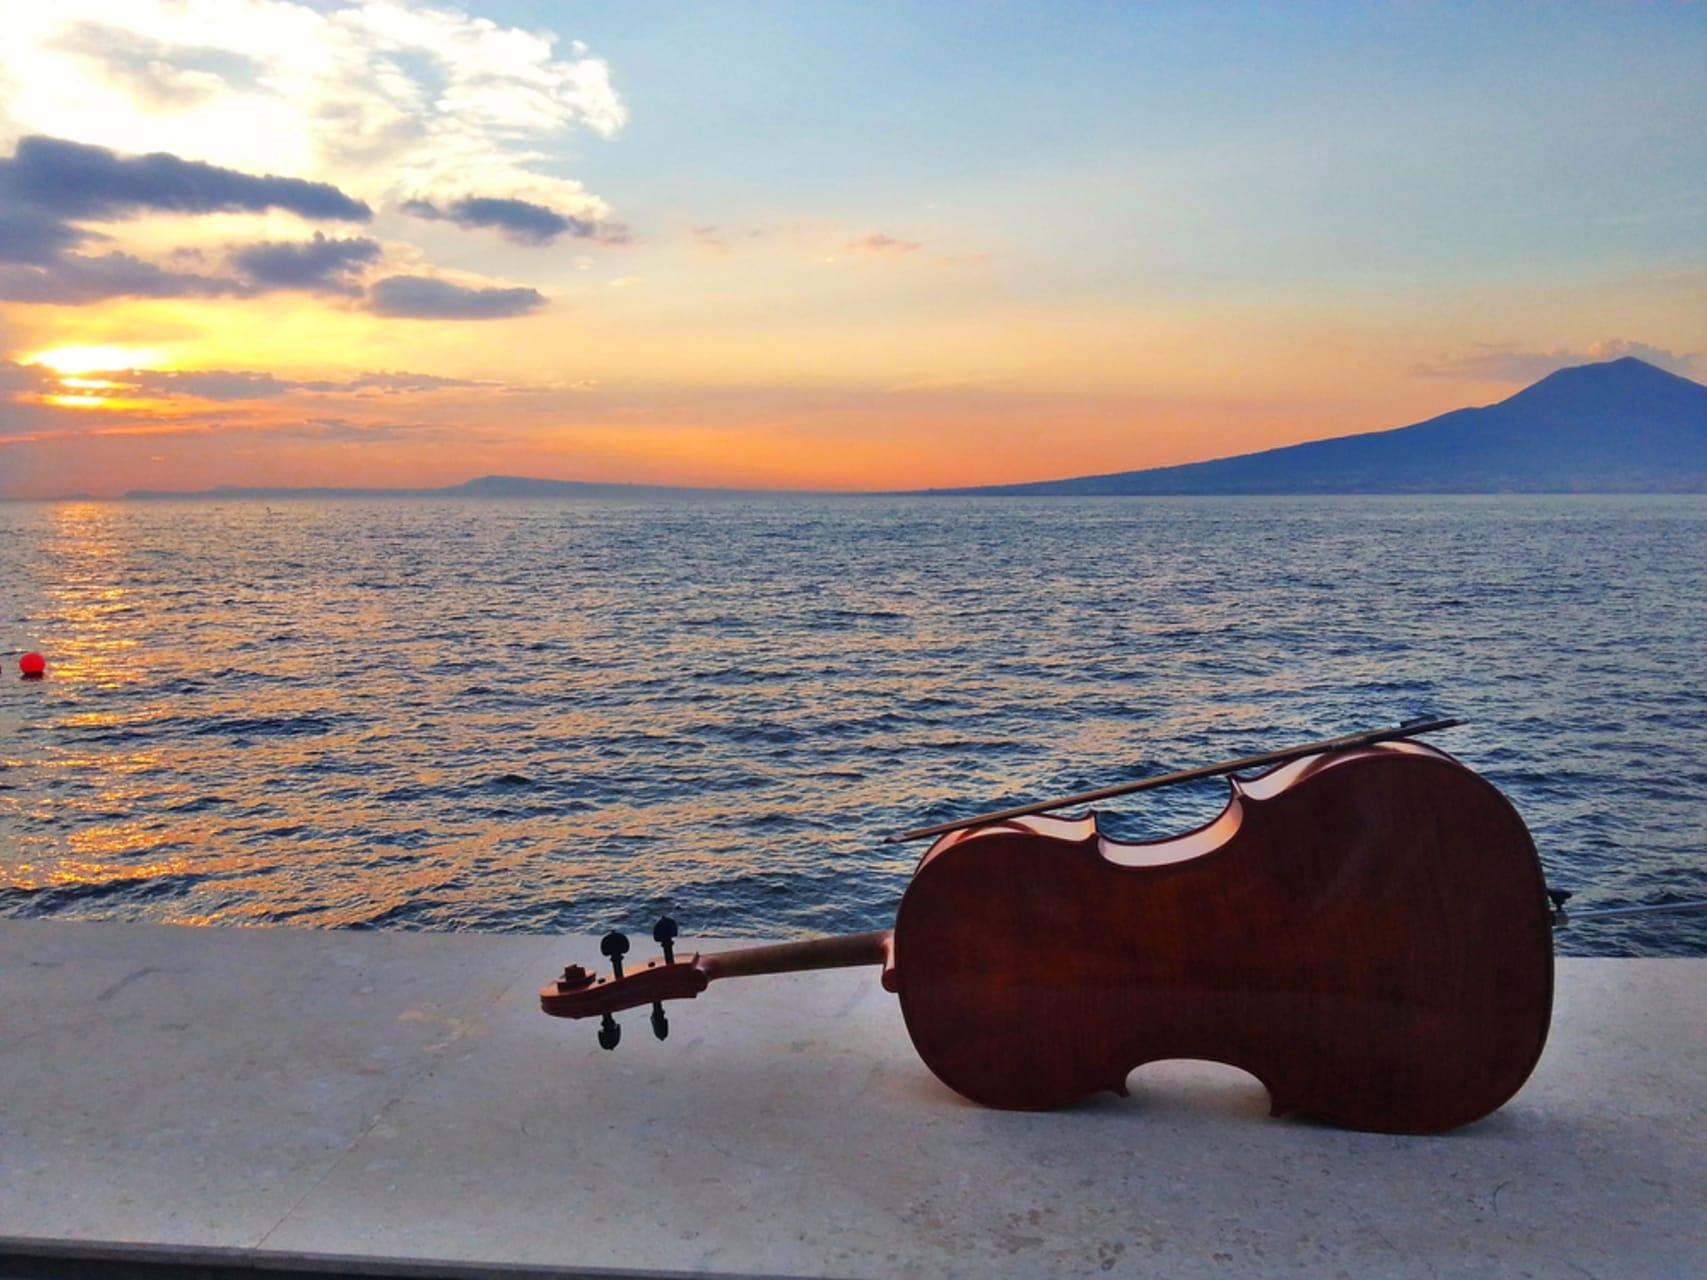 Sorrento - World Music Day Special: Sorrento - Coast of Arts